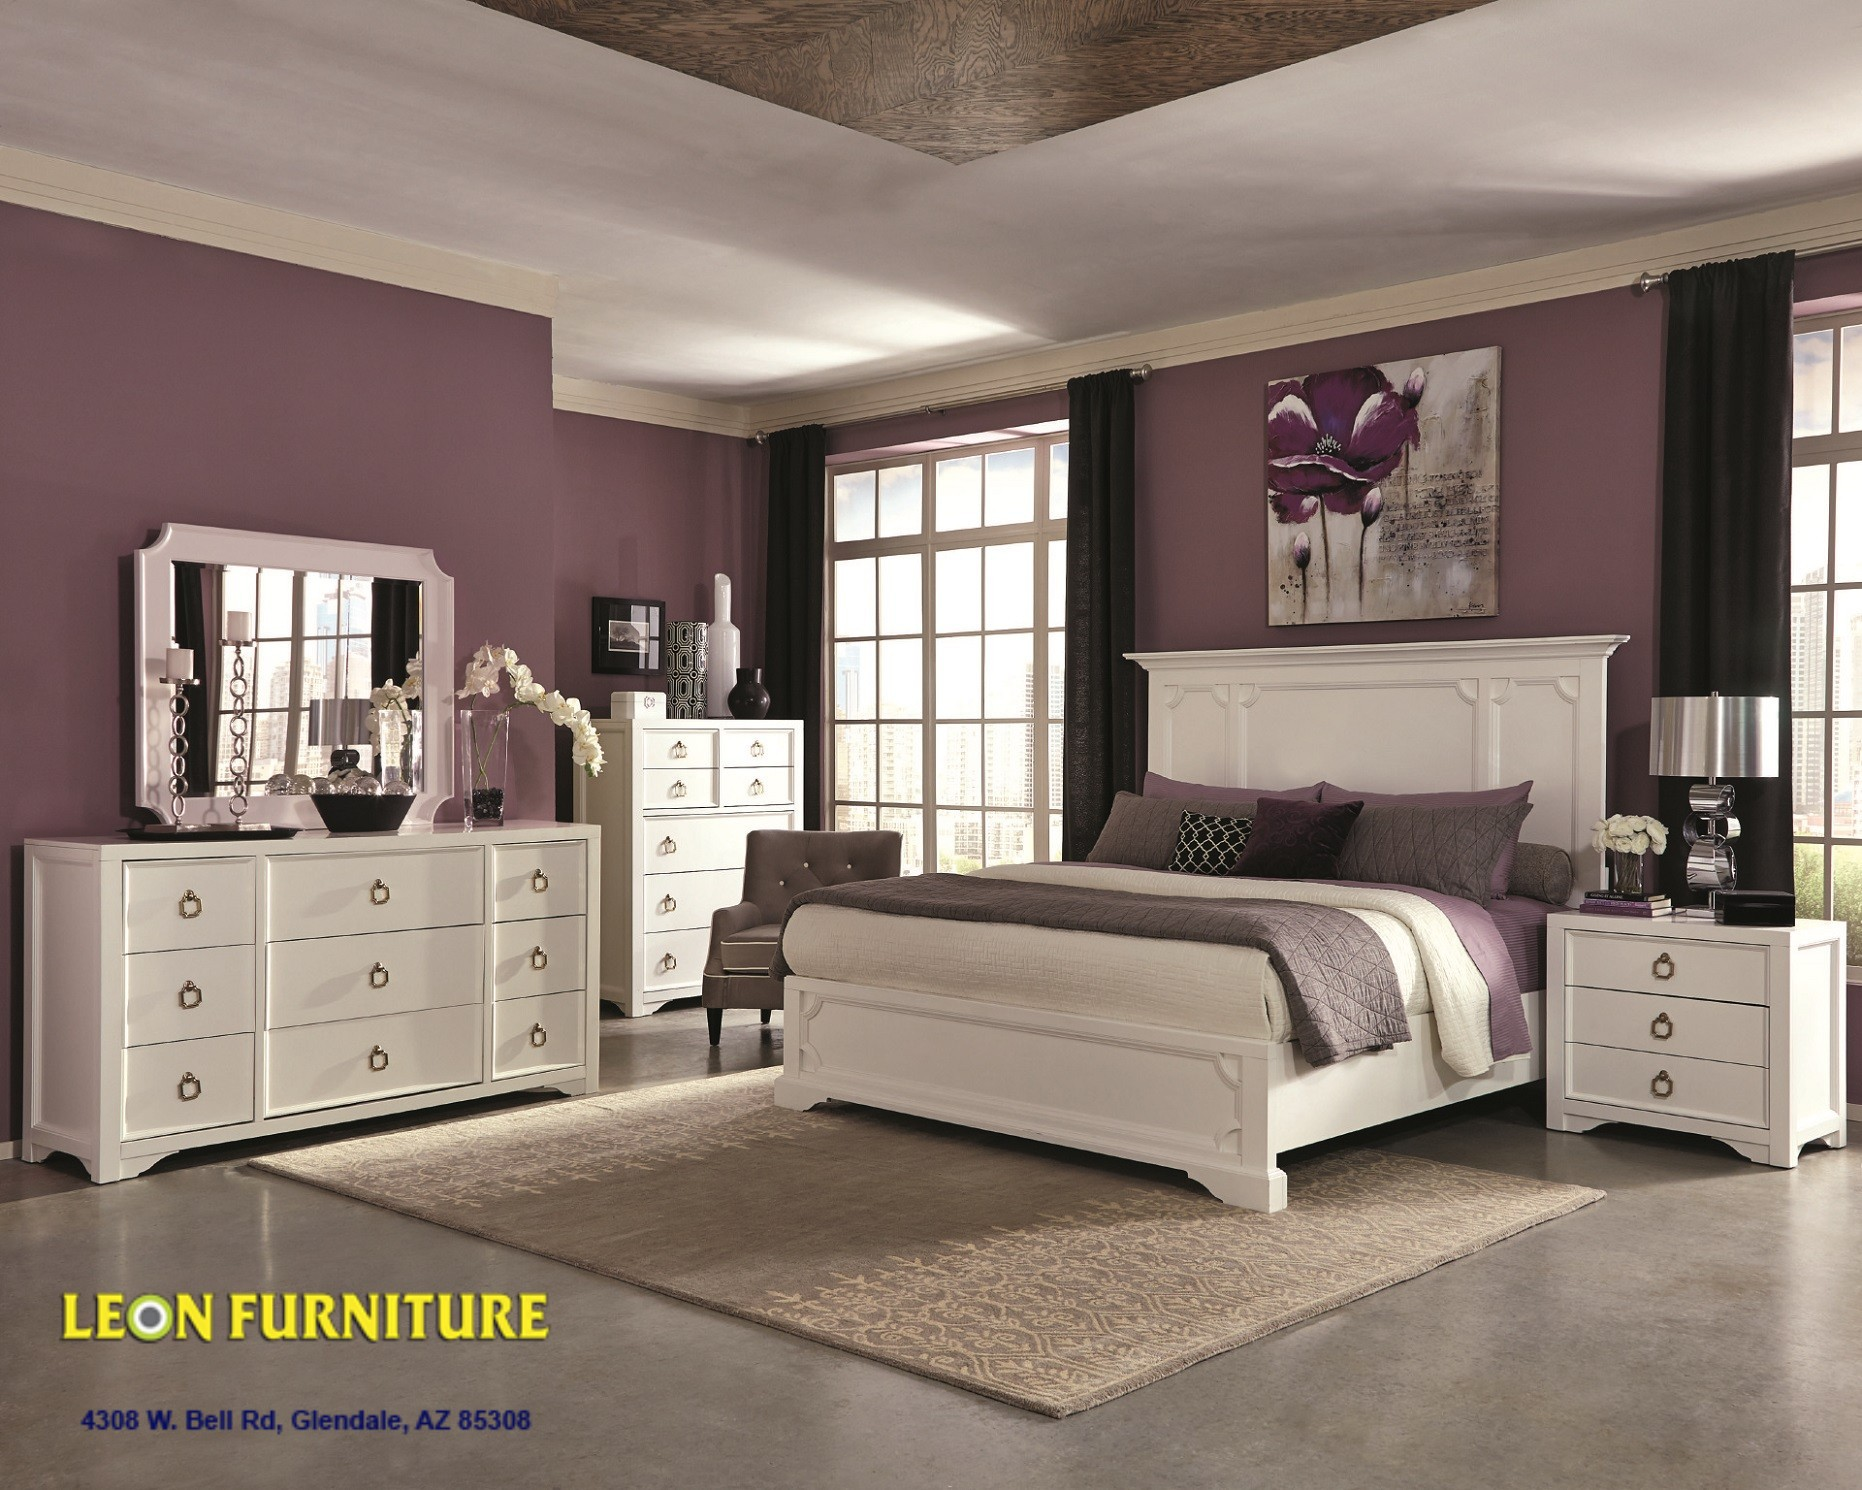 Bedroom Furniture Phoenix Archives - Articles Hubspot